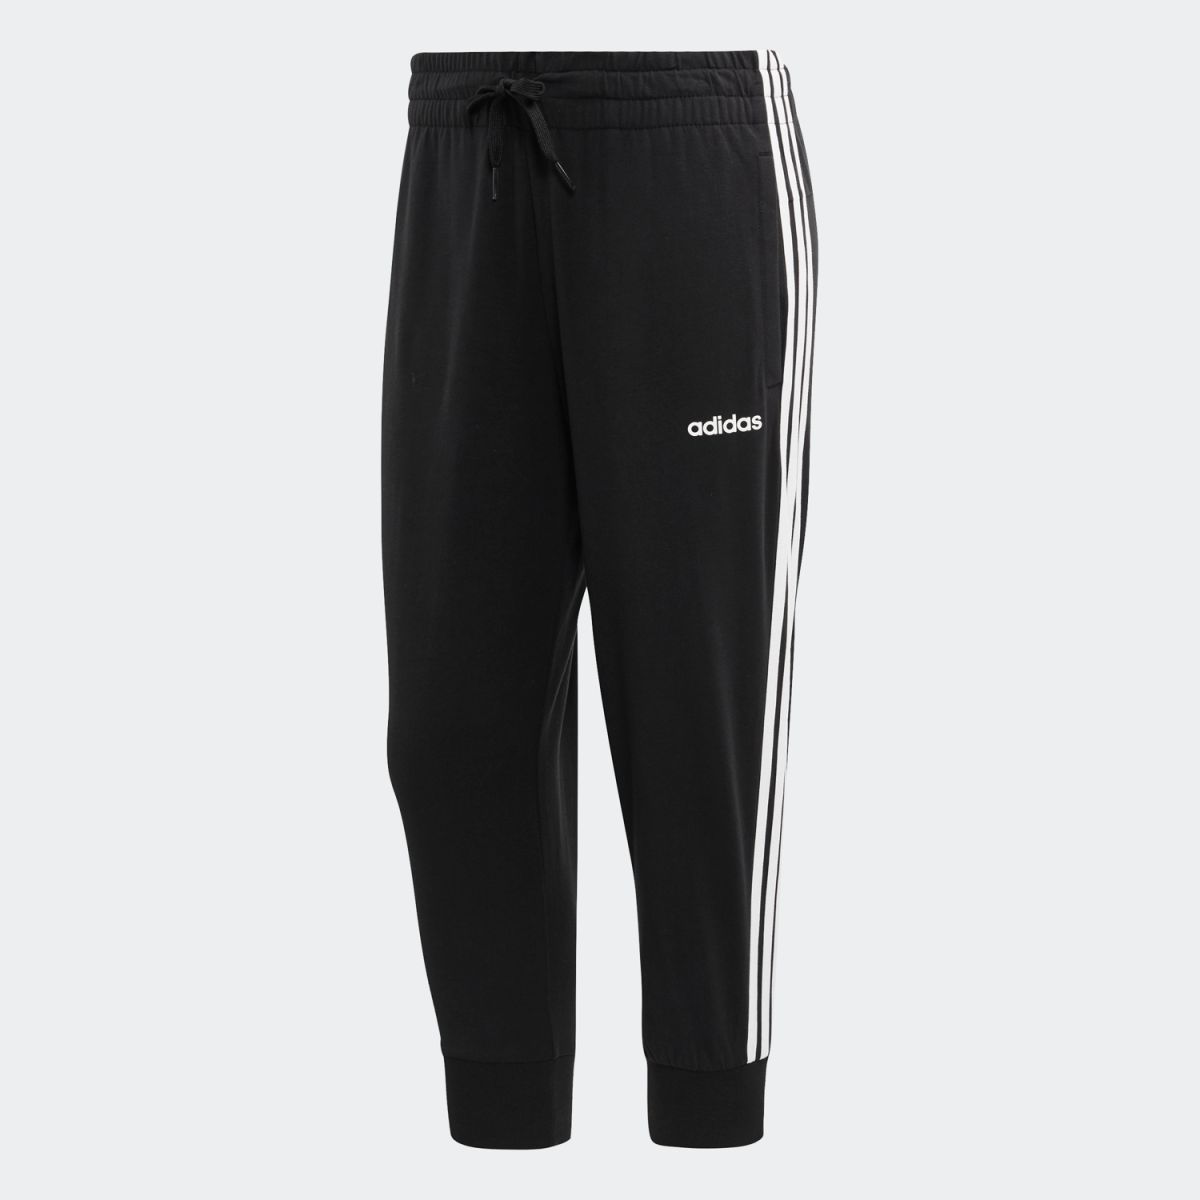 adidas 3/4 sweats